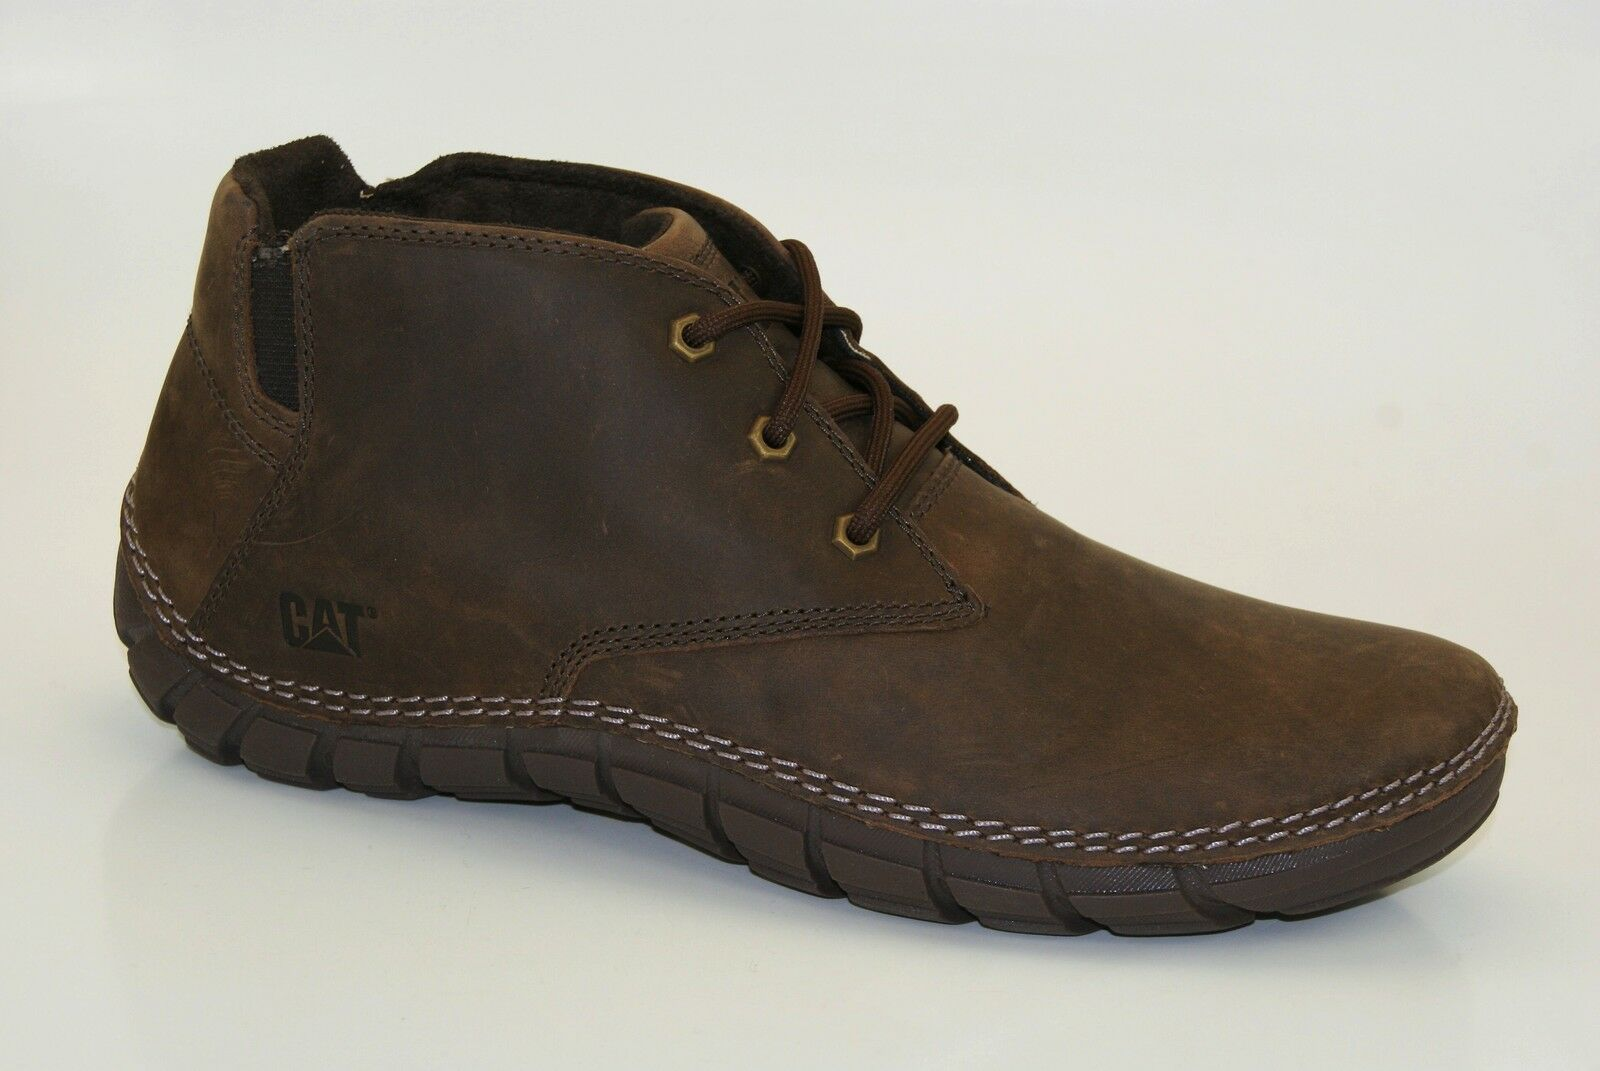 CAT Caterpillar Dryton Chukka Boots 46 US 13 Herren Schnürschuhe Schuhe P717870